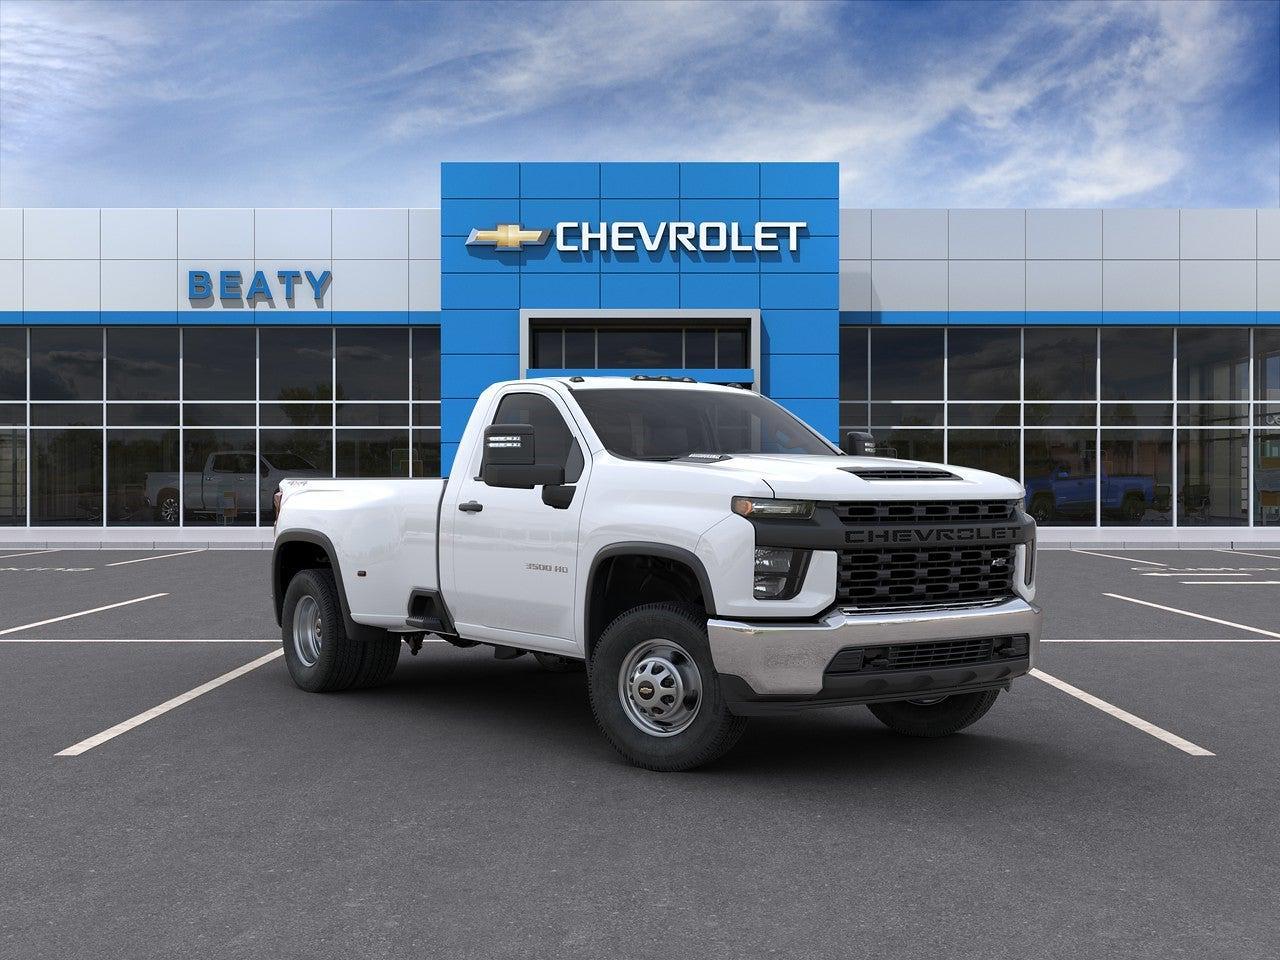 2020 Chevrolet Silverado 3500 Regular Cab 4x4, CM Truck Beds Platform Body #23022 - photo 1